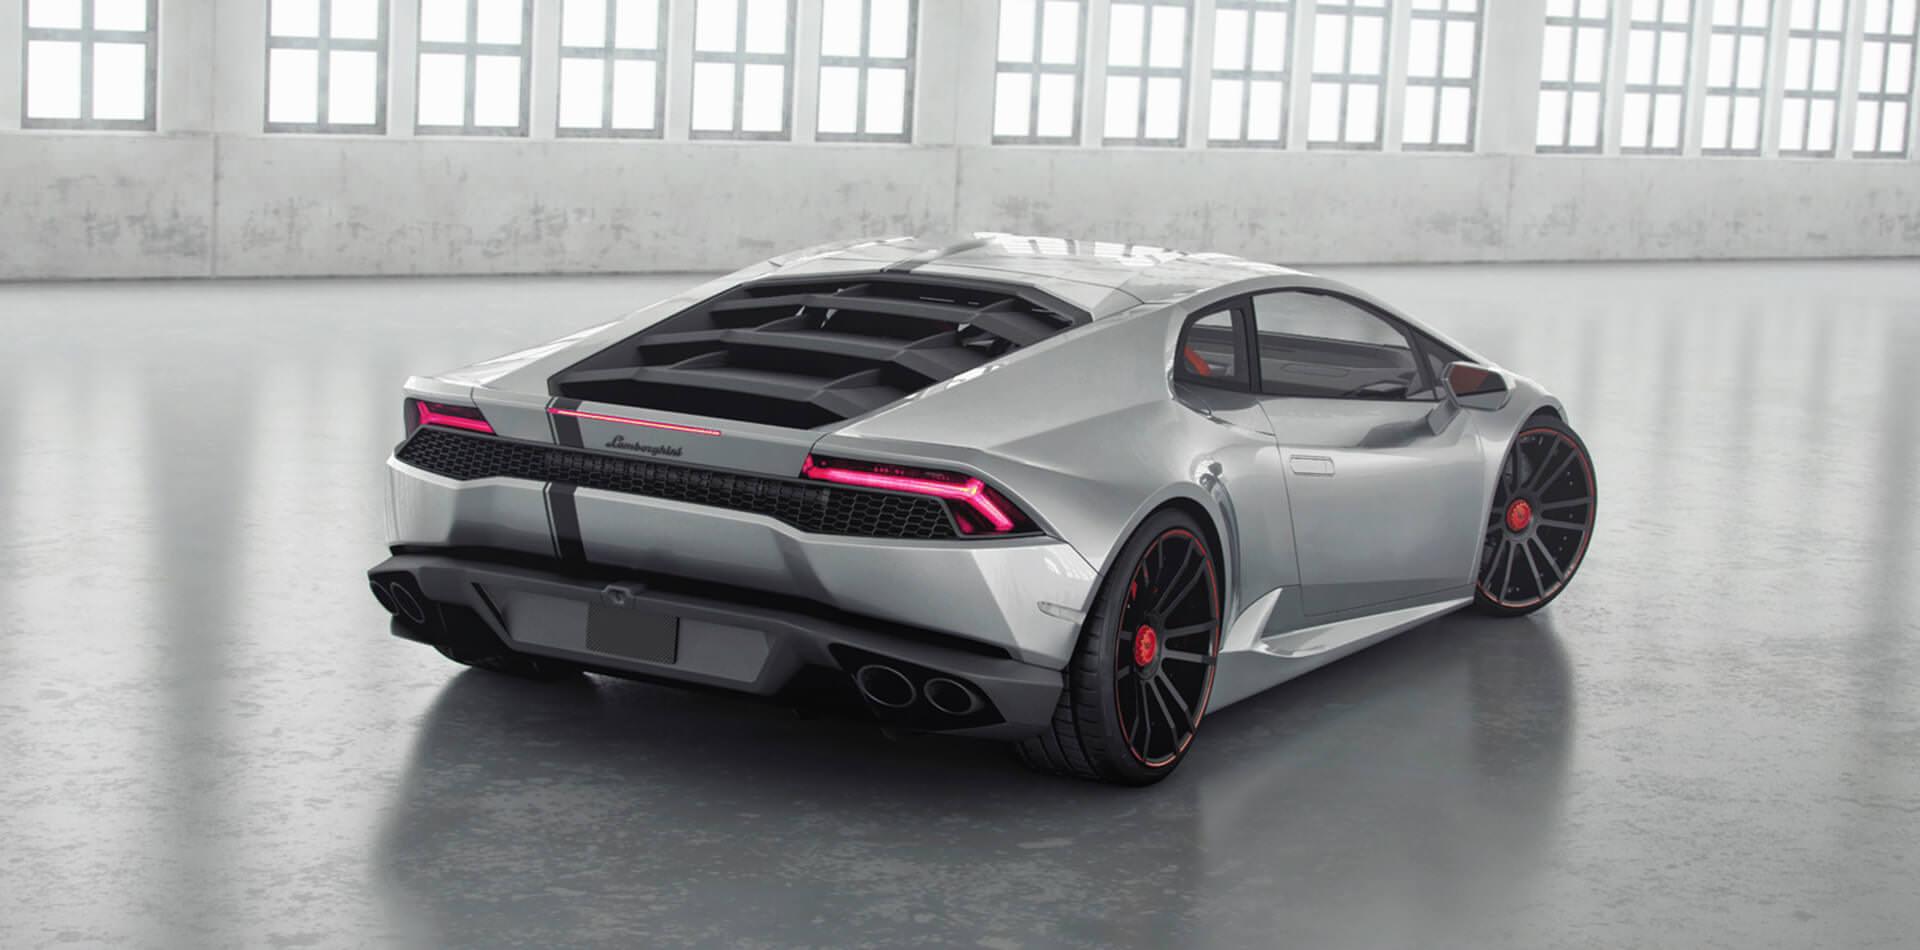 Tuning_Huracan_Lamborghini